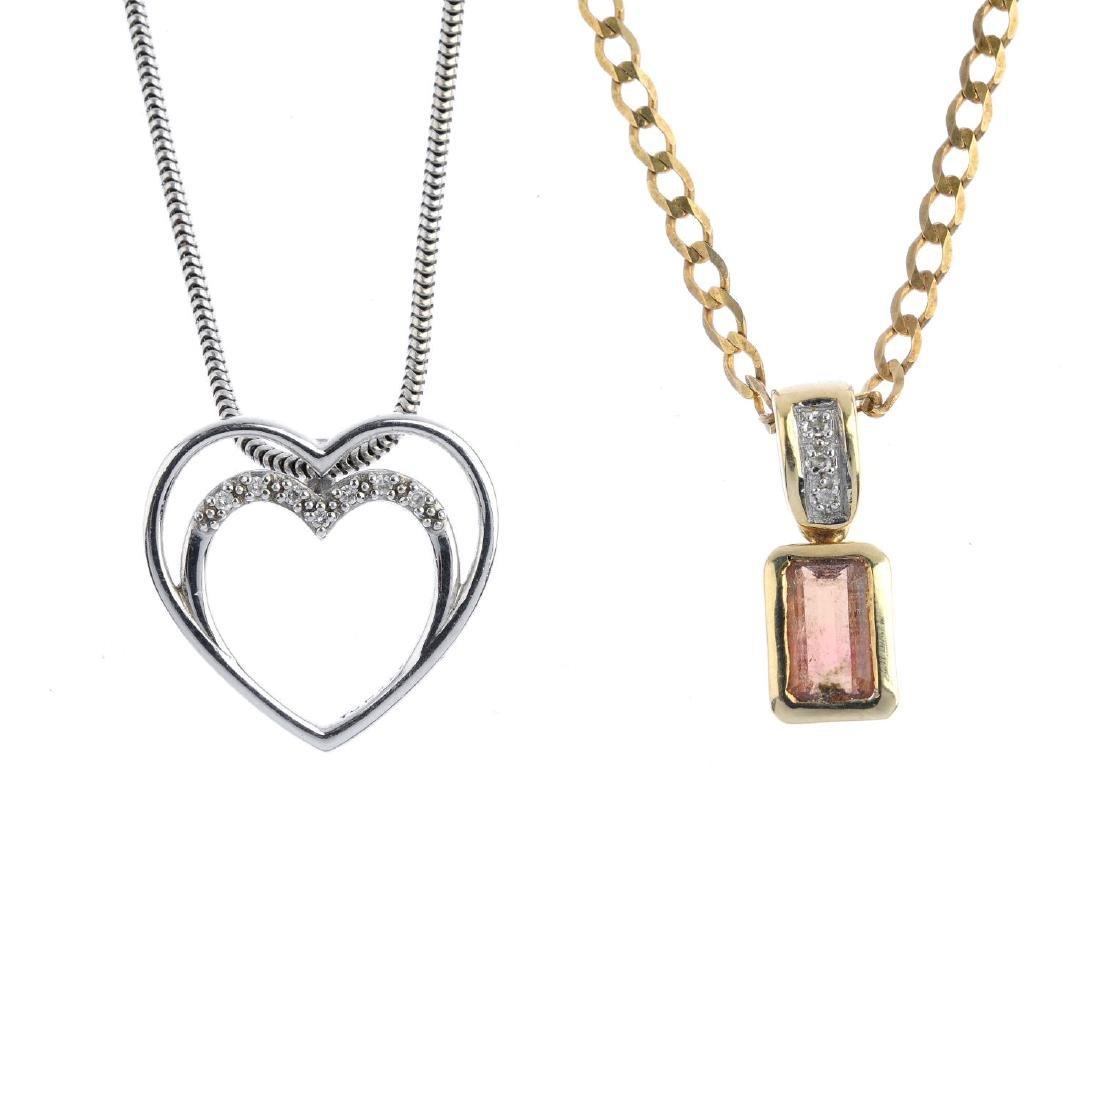 Two 9ct gold diamond and tourmaline pendants. To